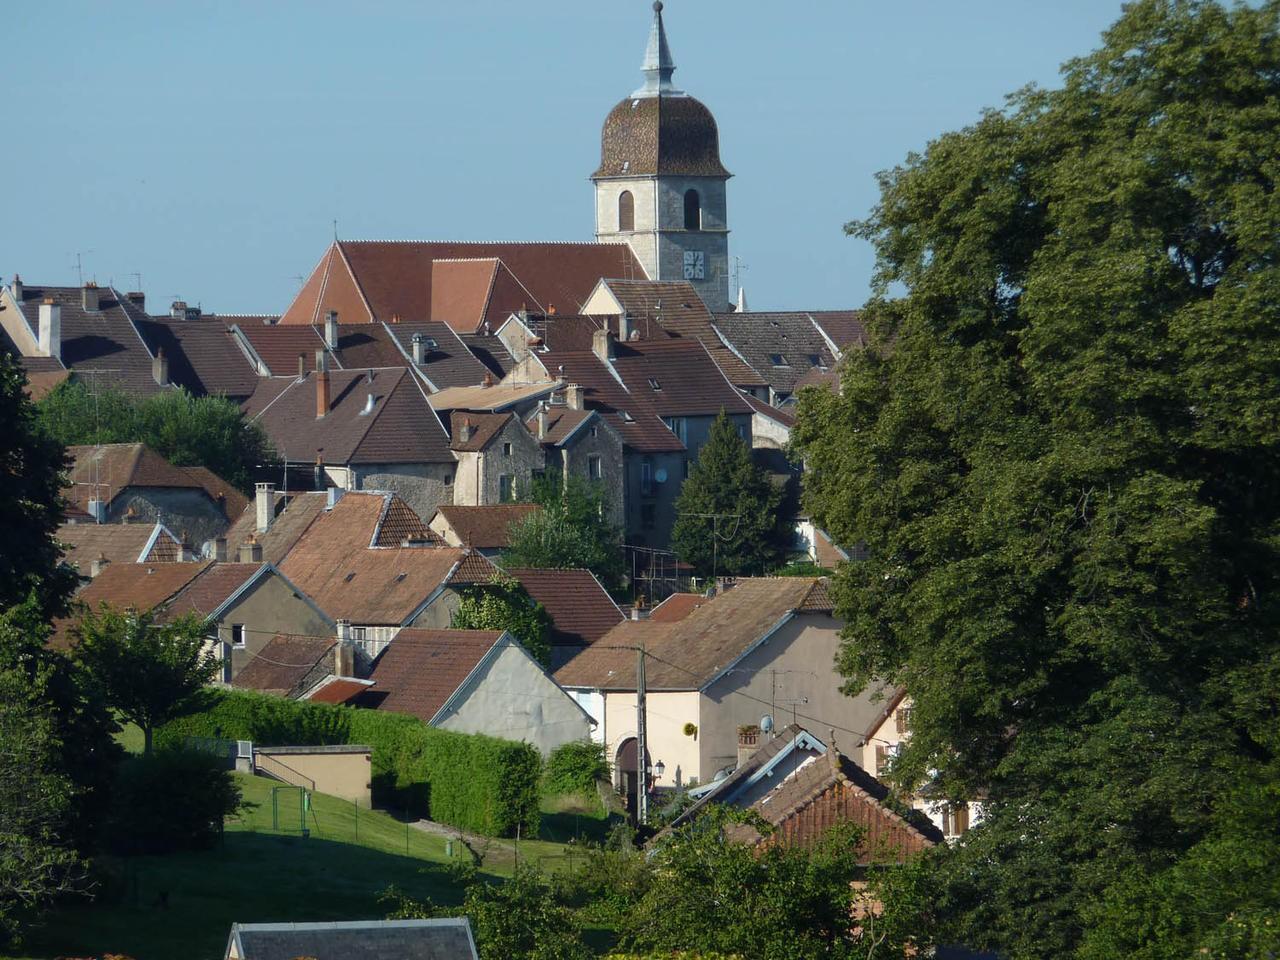 DEPANNAGE ASSISTANCE FRANCHE COMTE VILLERSEXEL